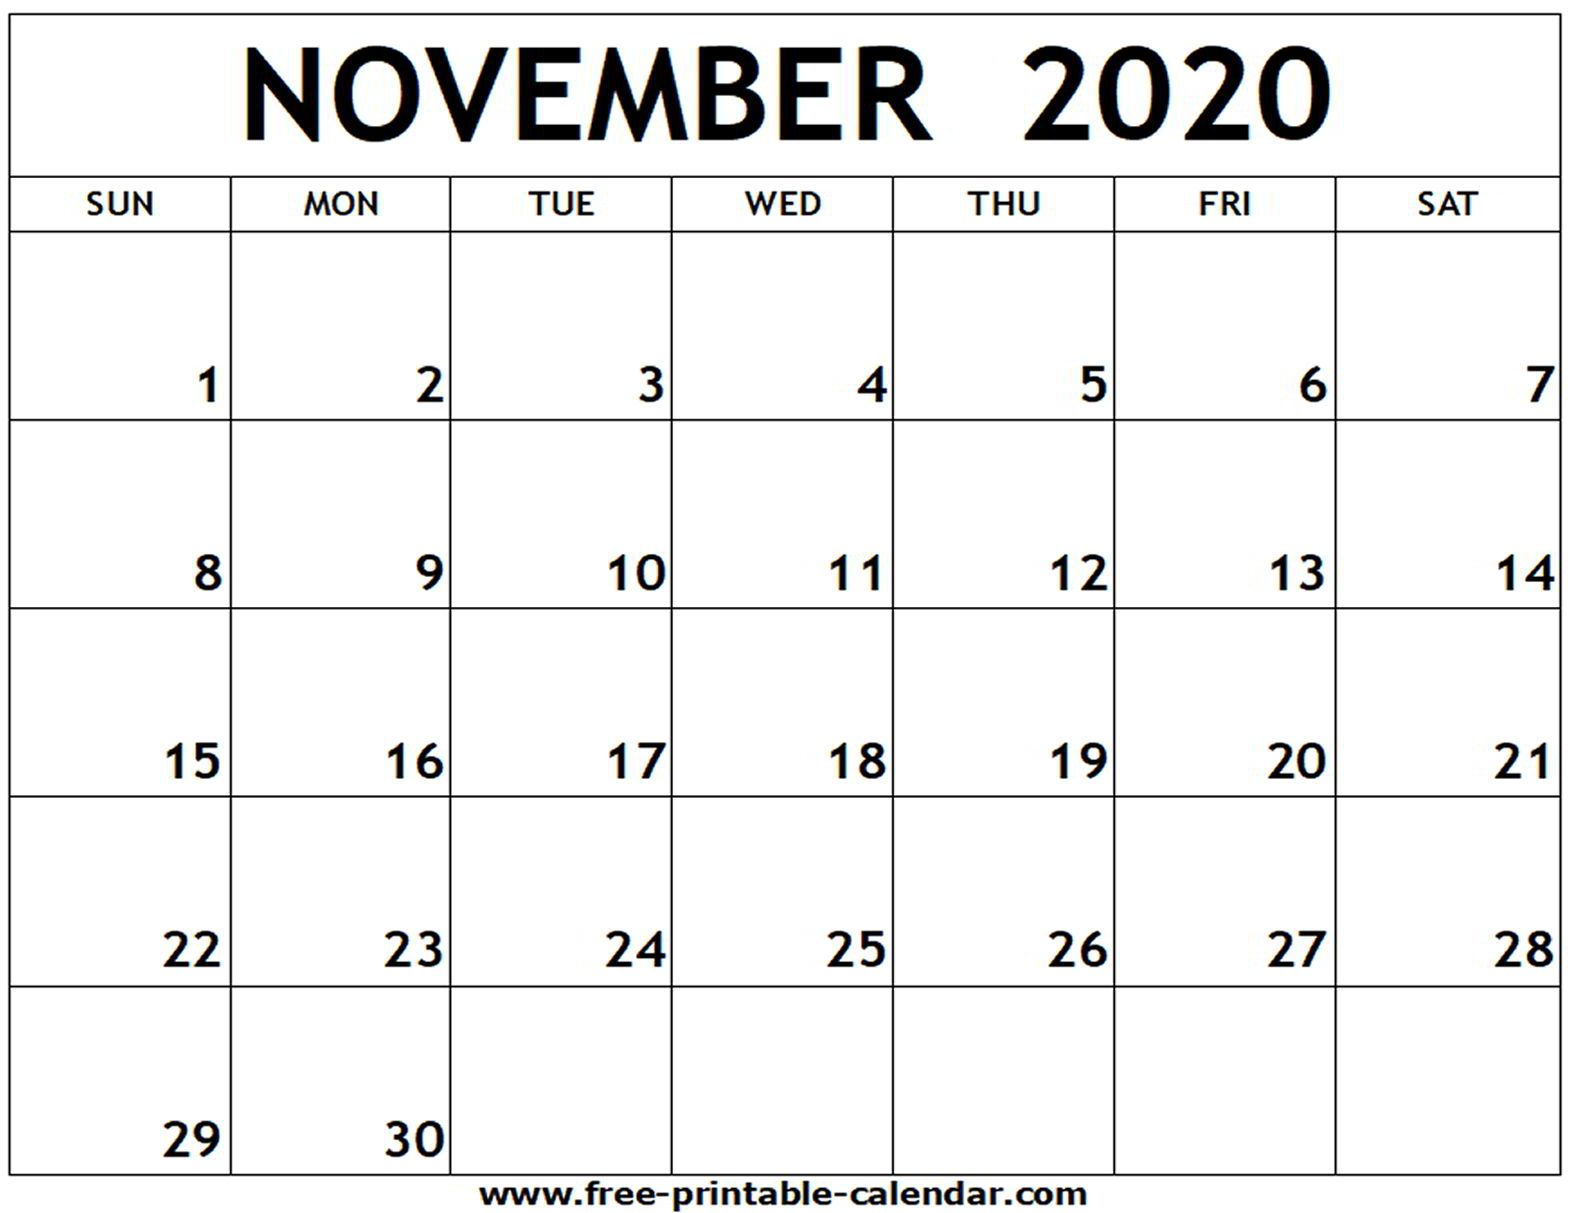 009 Stunning Printable Calendar Template November 2020 Picture  FreeFull